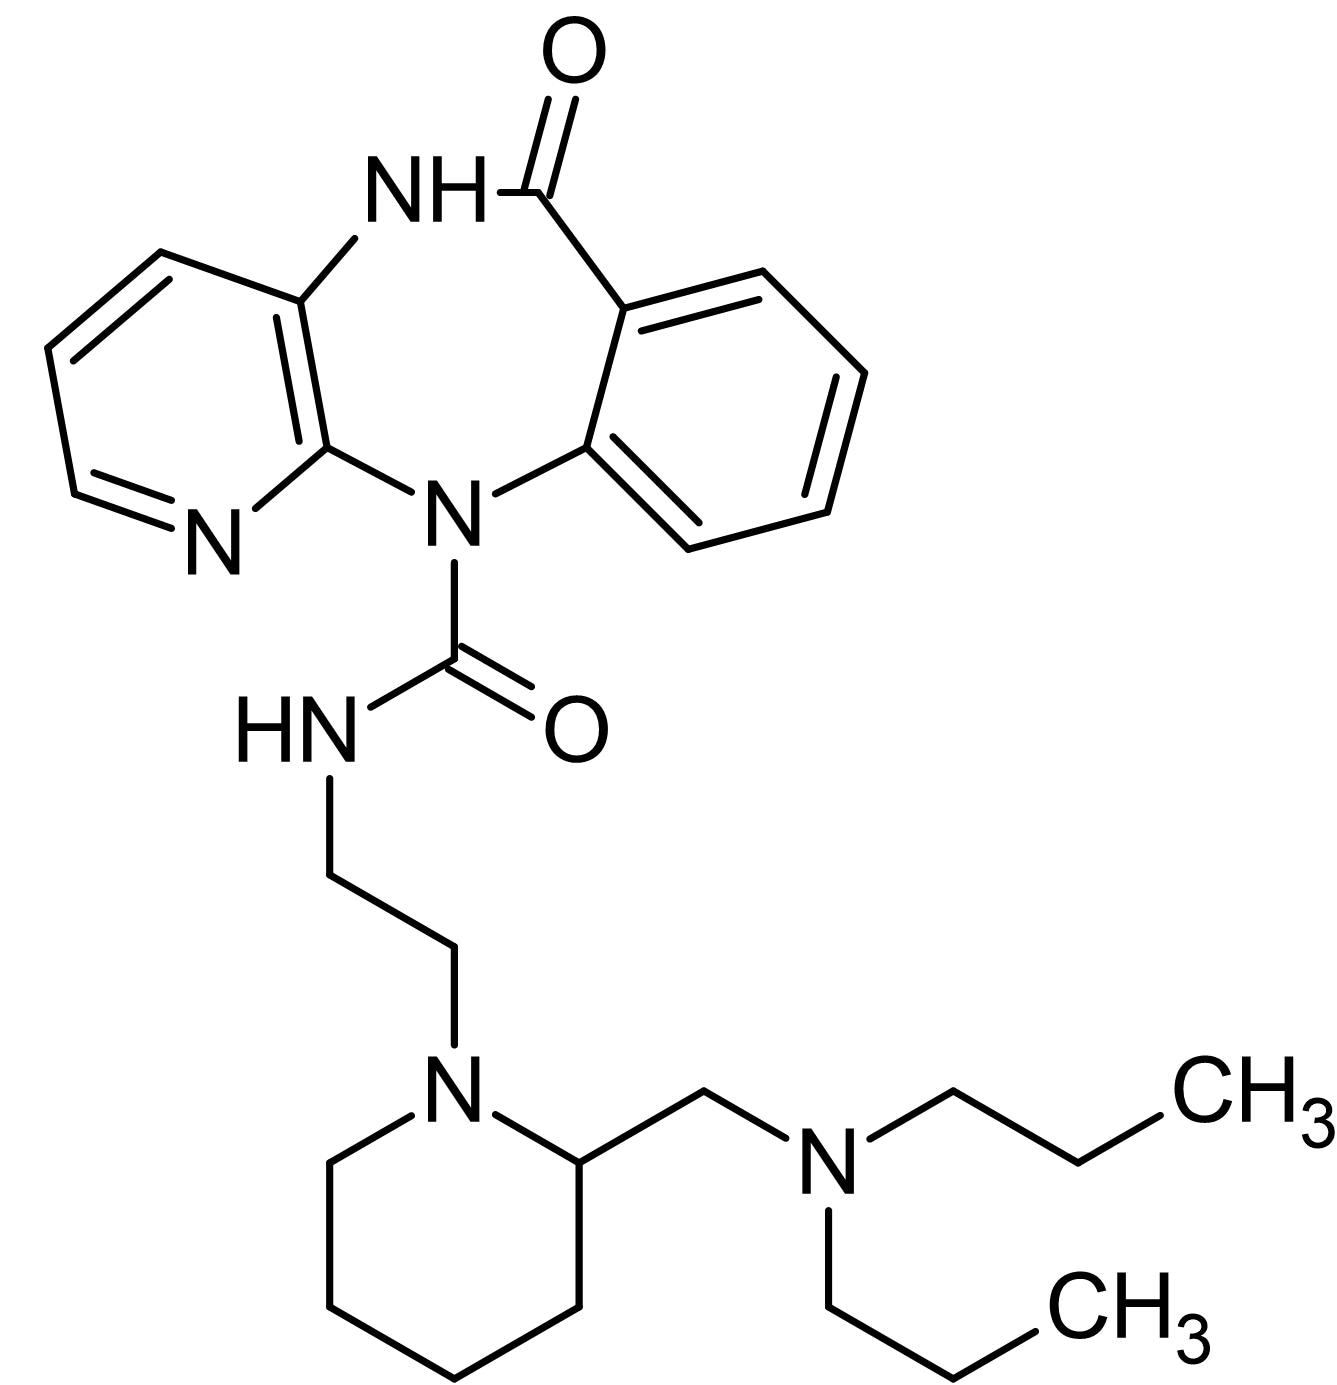 Chemical Structure - AF-DX 384, M<sub>2</sub>/M<sub>4</sub> antagonist (ab120146)